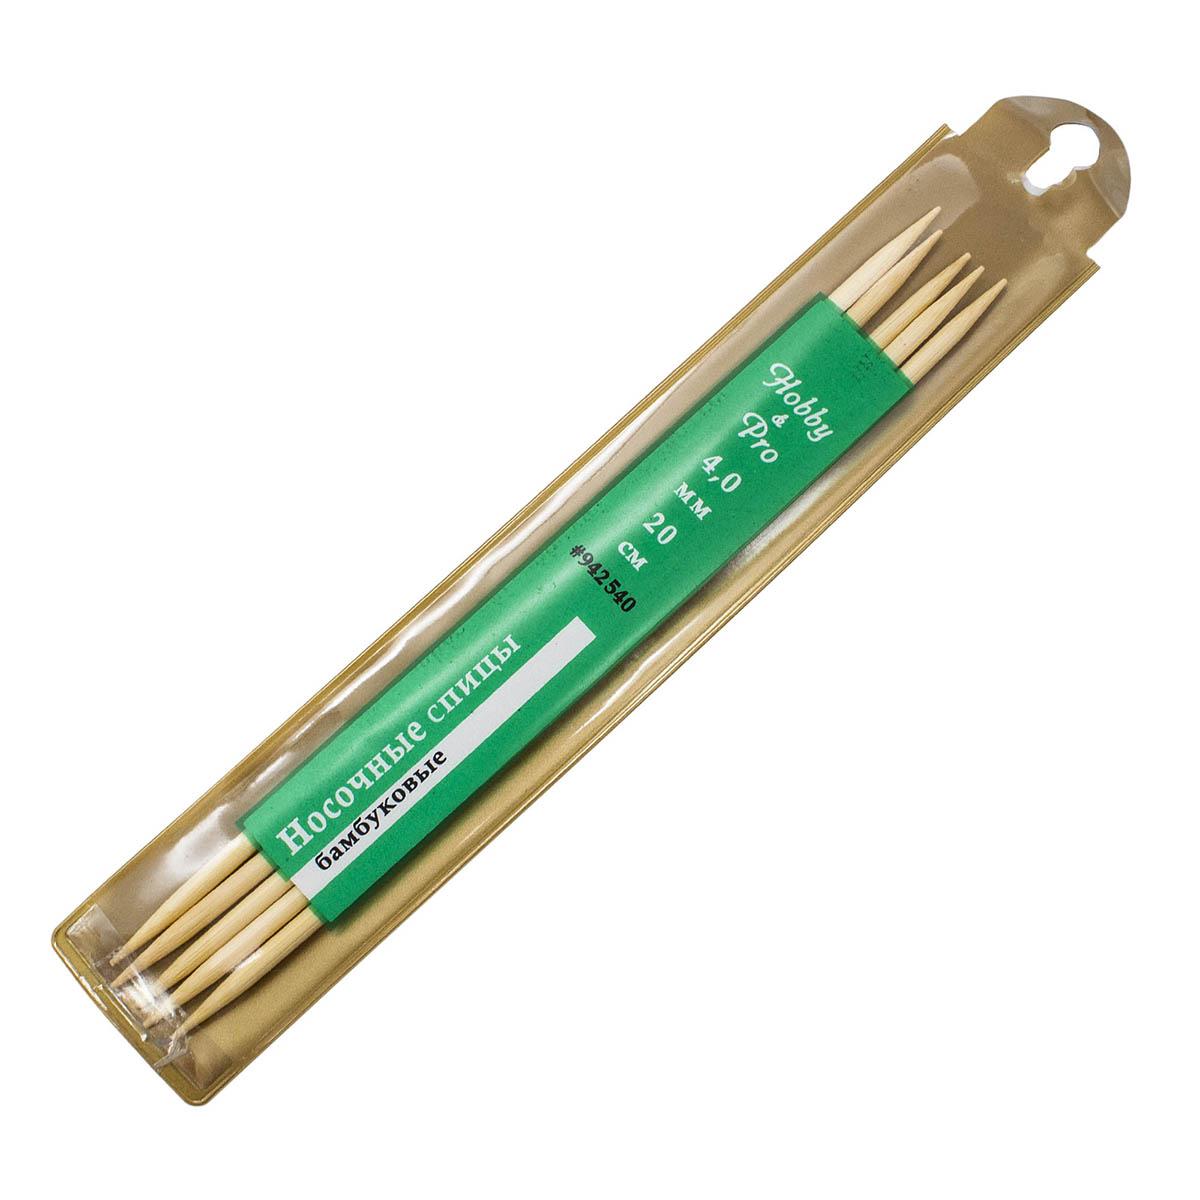 Спицы носочные бамбук 942540, 20 см, 4,0 мм, Hobby&Pro